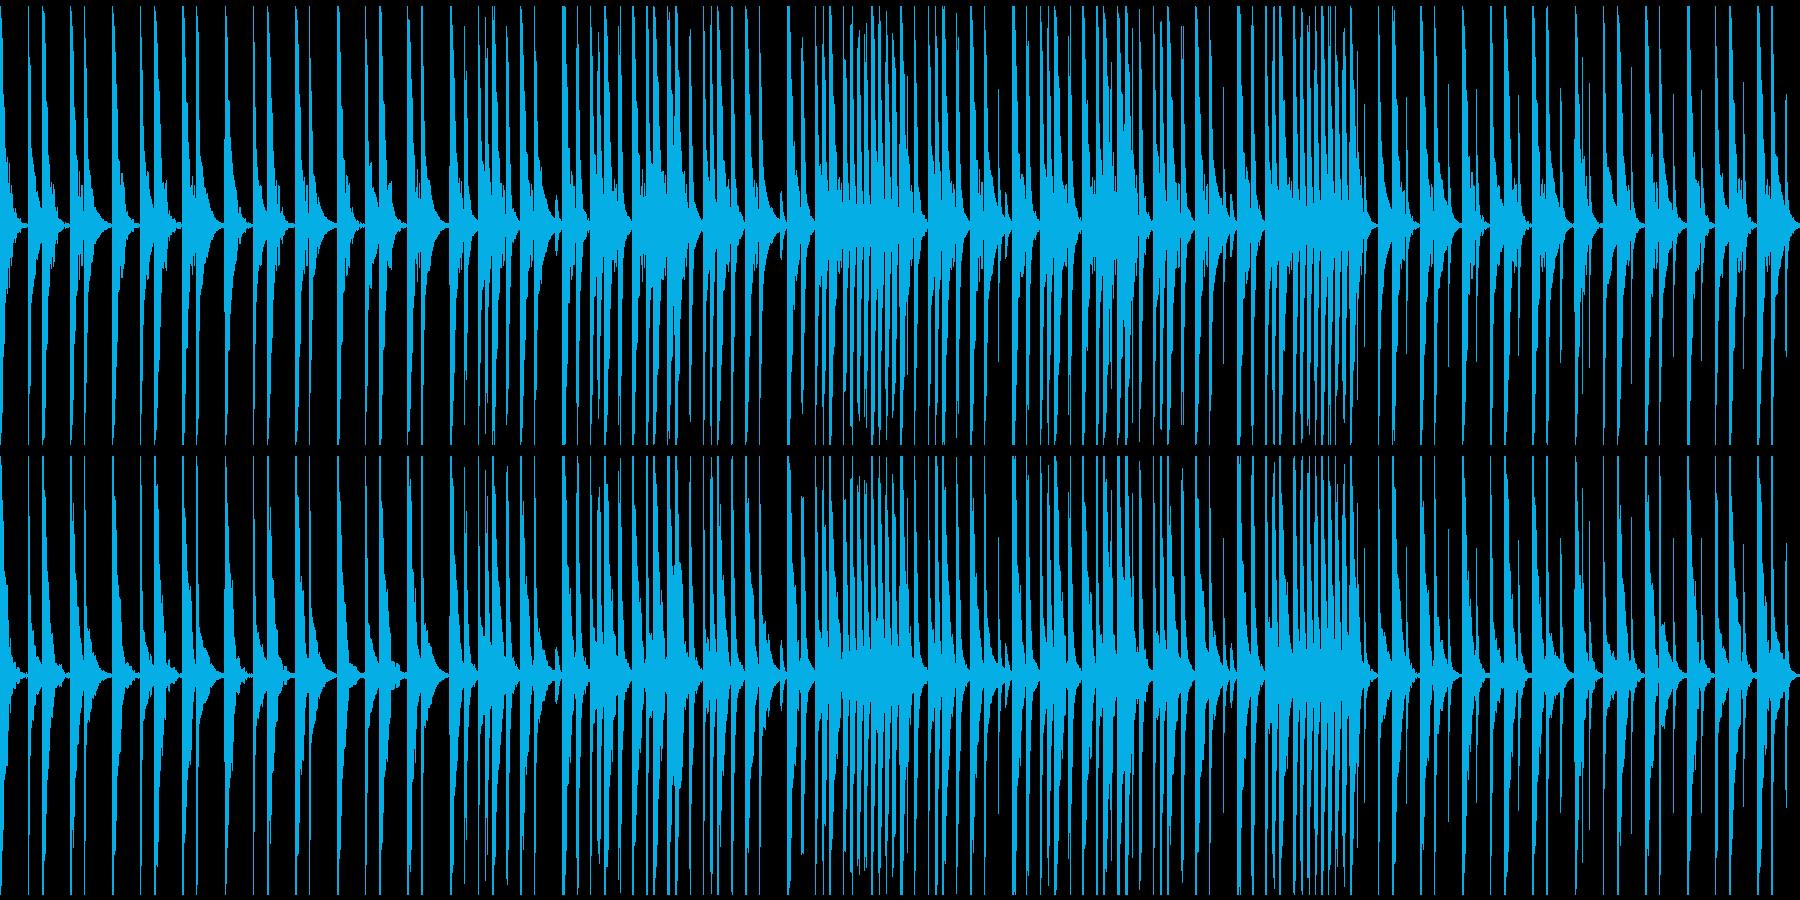 P〇AP、R〇ZAP風のドラムループの再生済みの波形